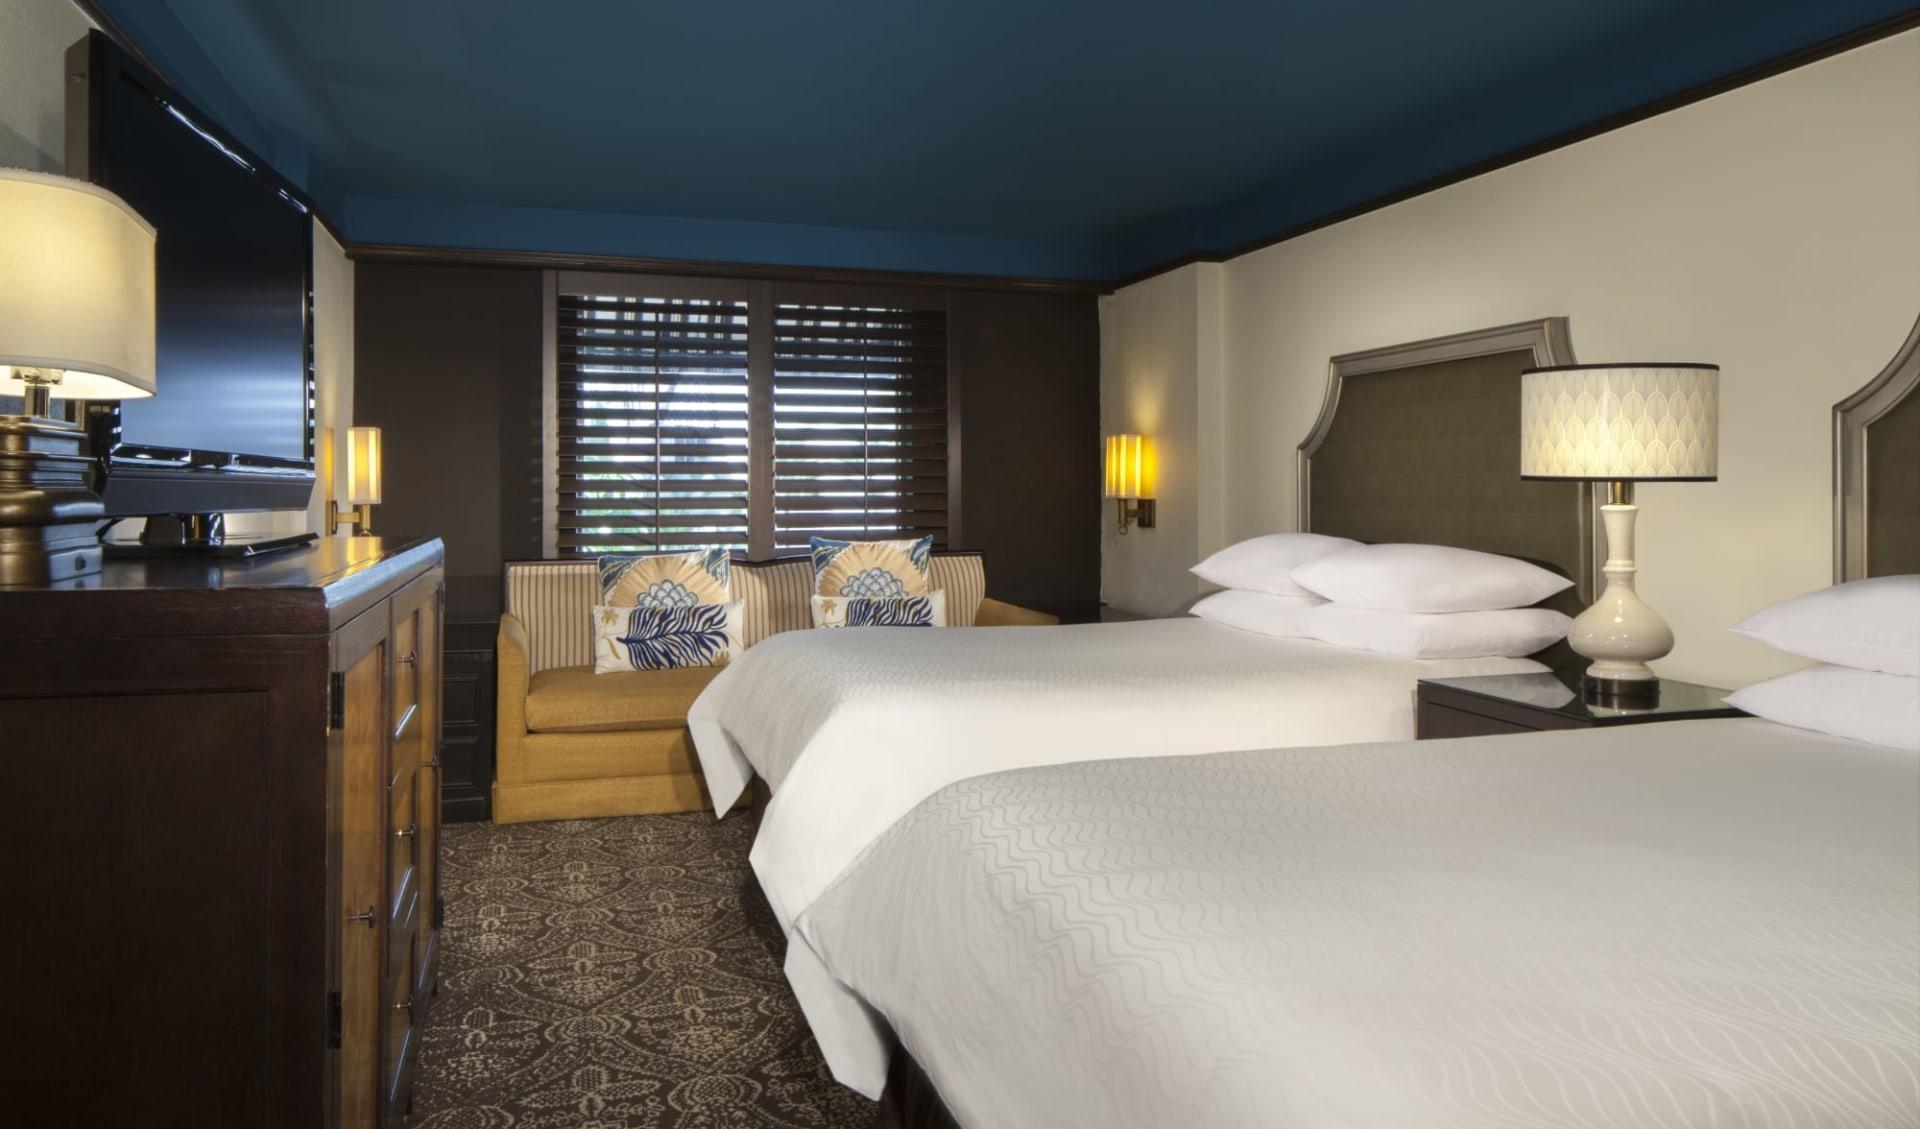 La Concha Hotel & Spa in Key West:  Crowne Plaza La Concha_Standard